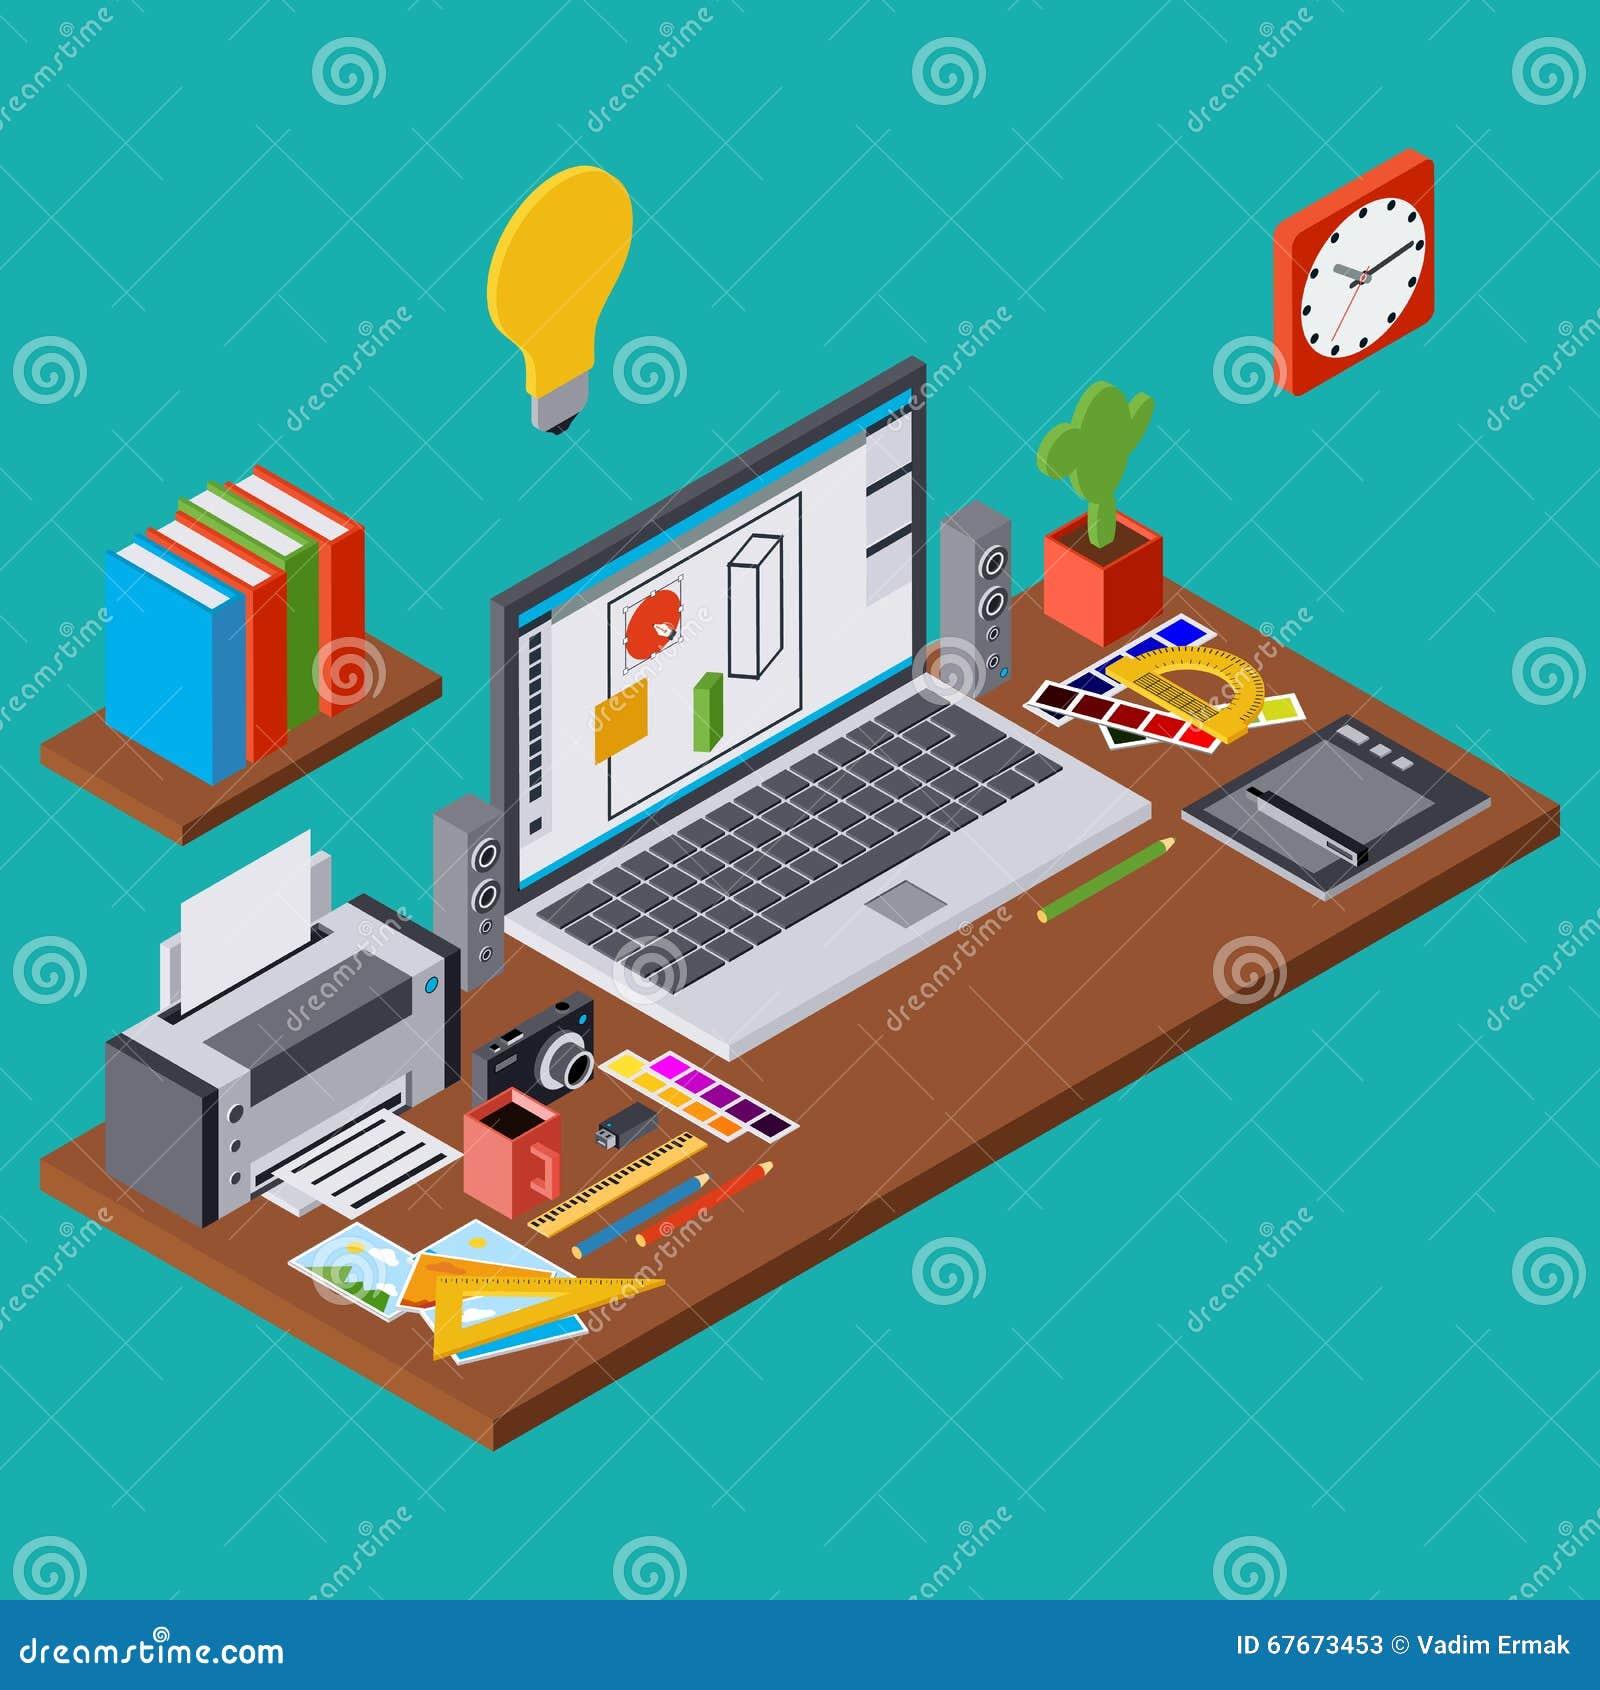 Creative Process Web Design Graphic Designer Workplace Vector Concept Stock Vector Illustration Of Digital Isometric 67673453